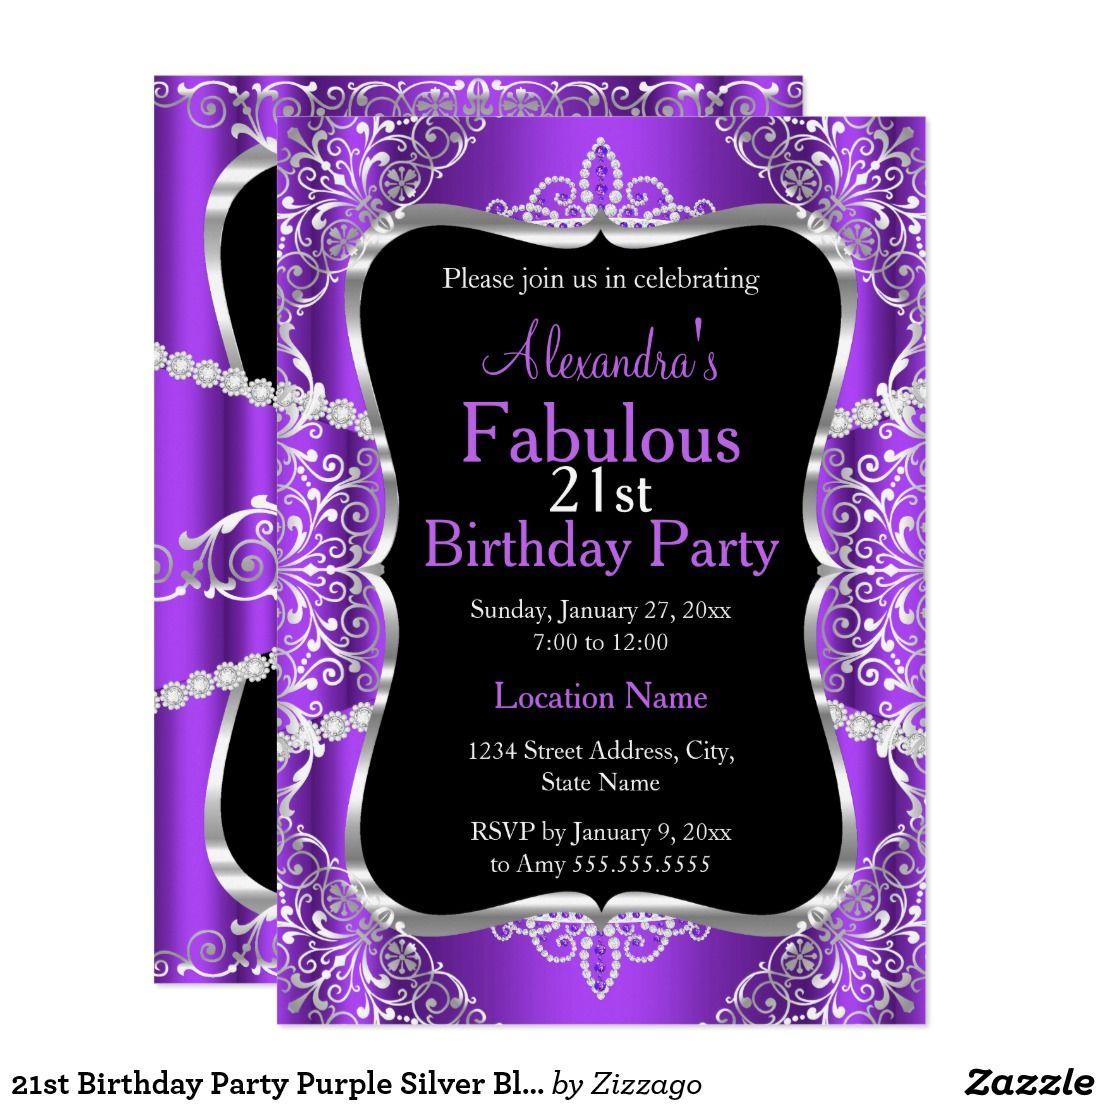 21st birthday party purple silver black